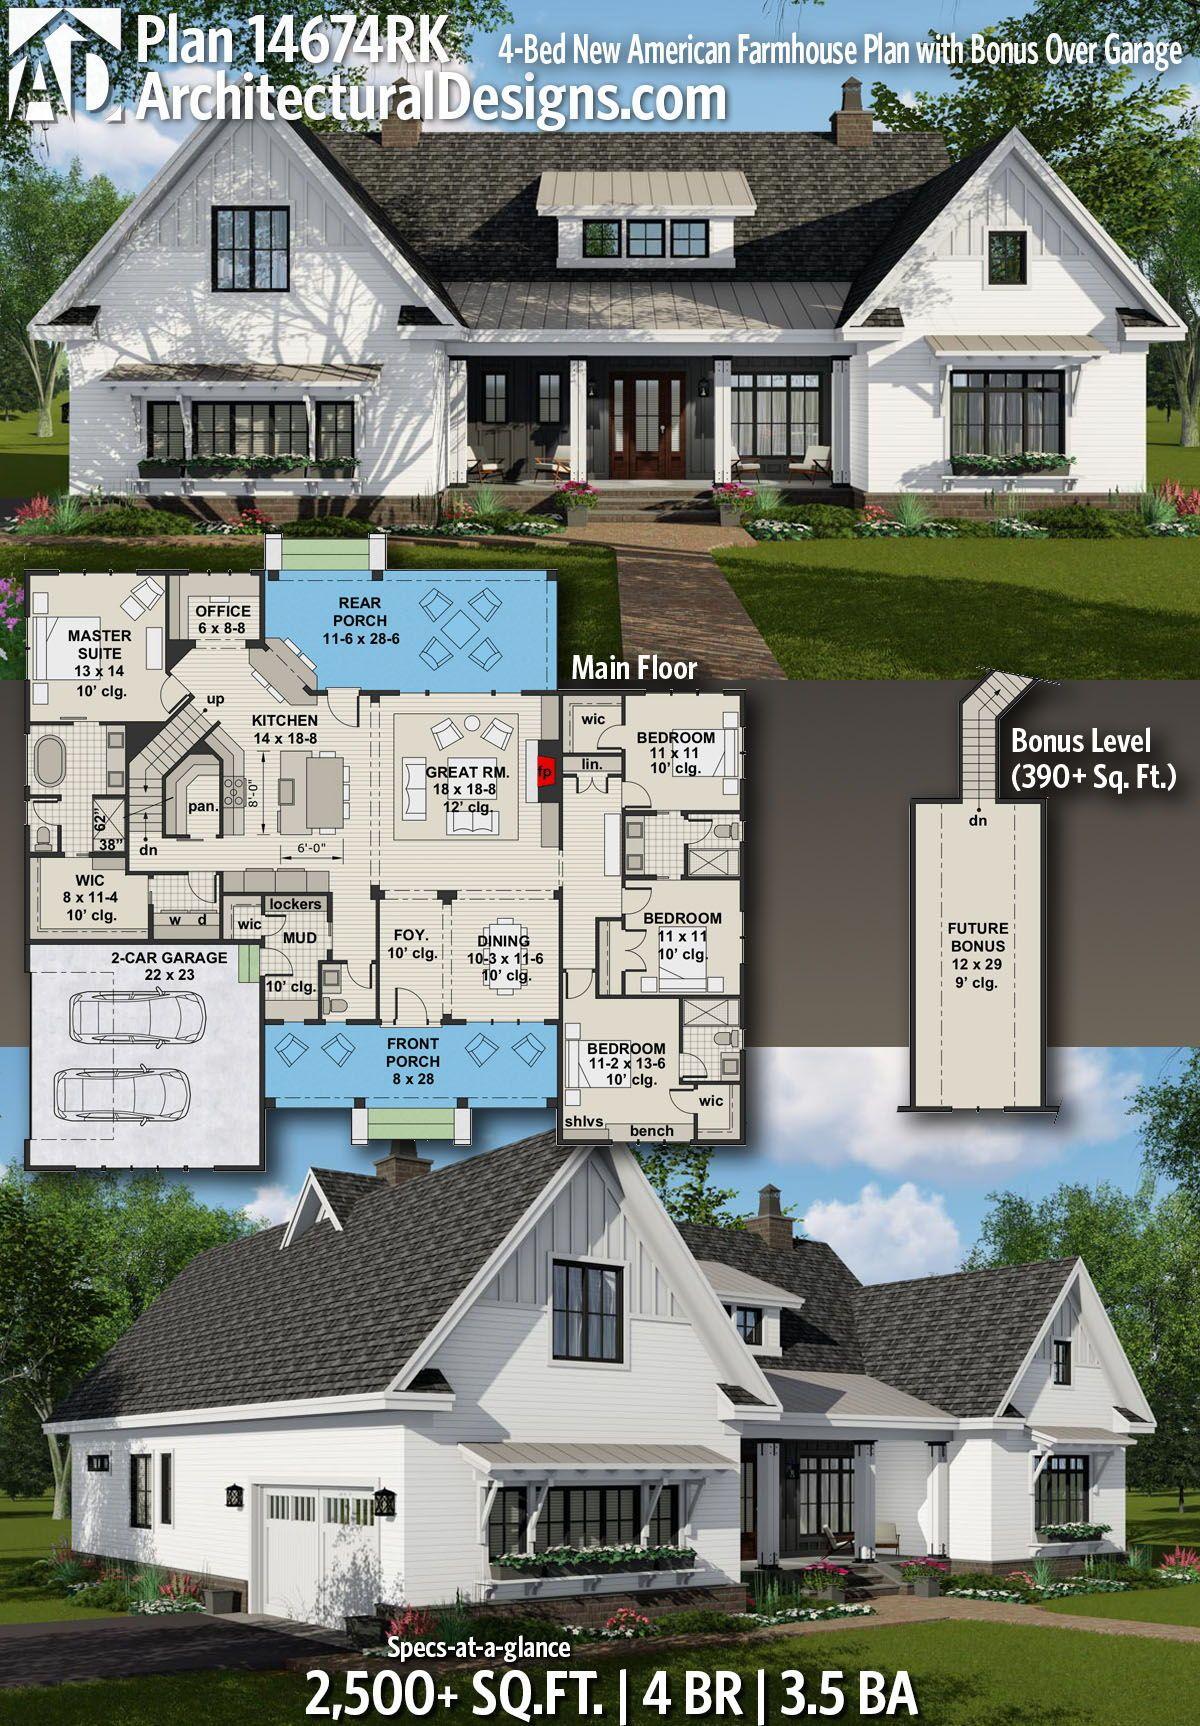 Plan 14674rk 4 Bed New American Farmhouse Plan With Bonus Over Garage New House Plans Modern Farmhouse Plans House Plans Farmhouse